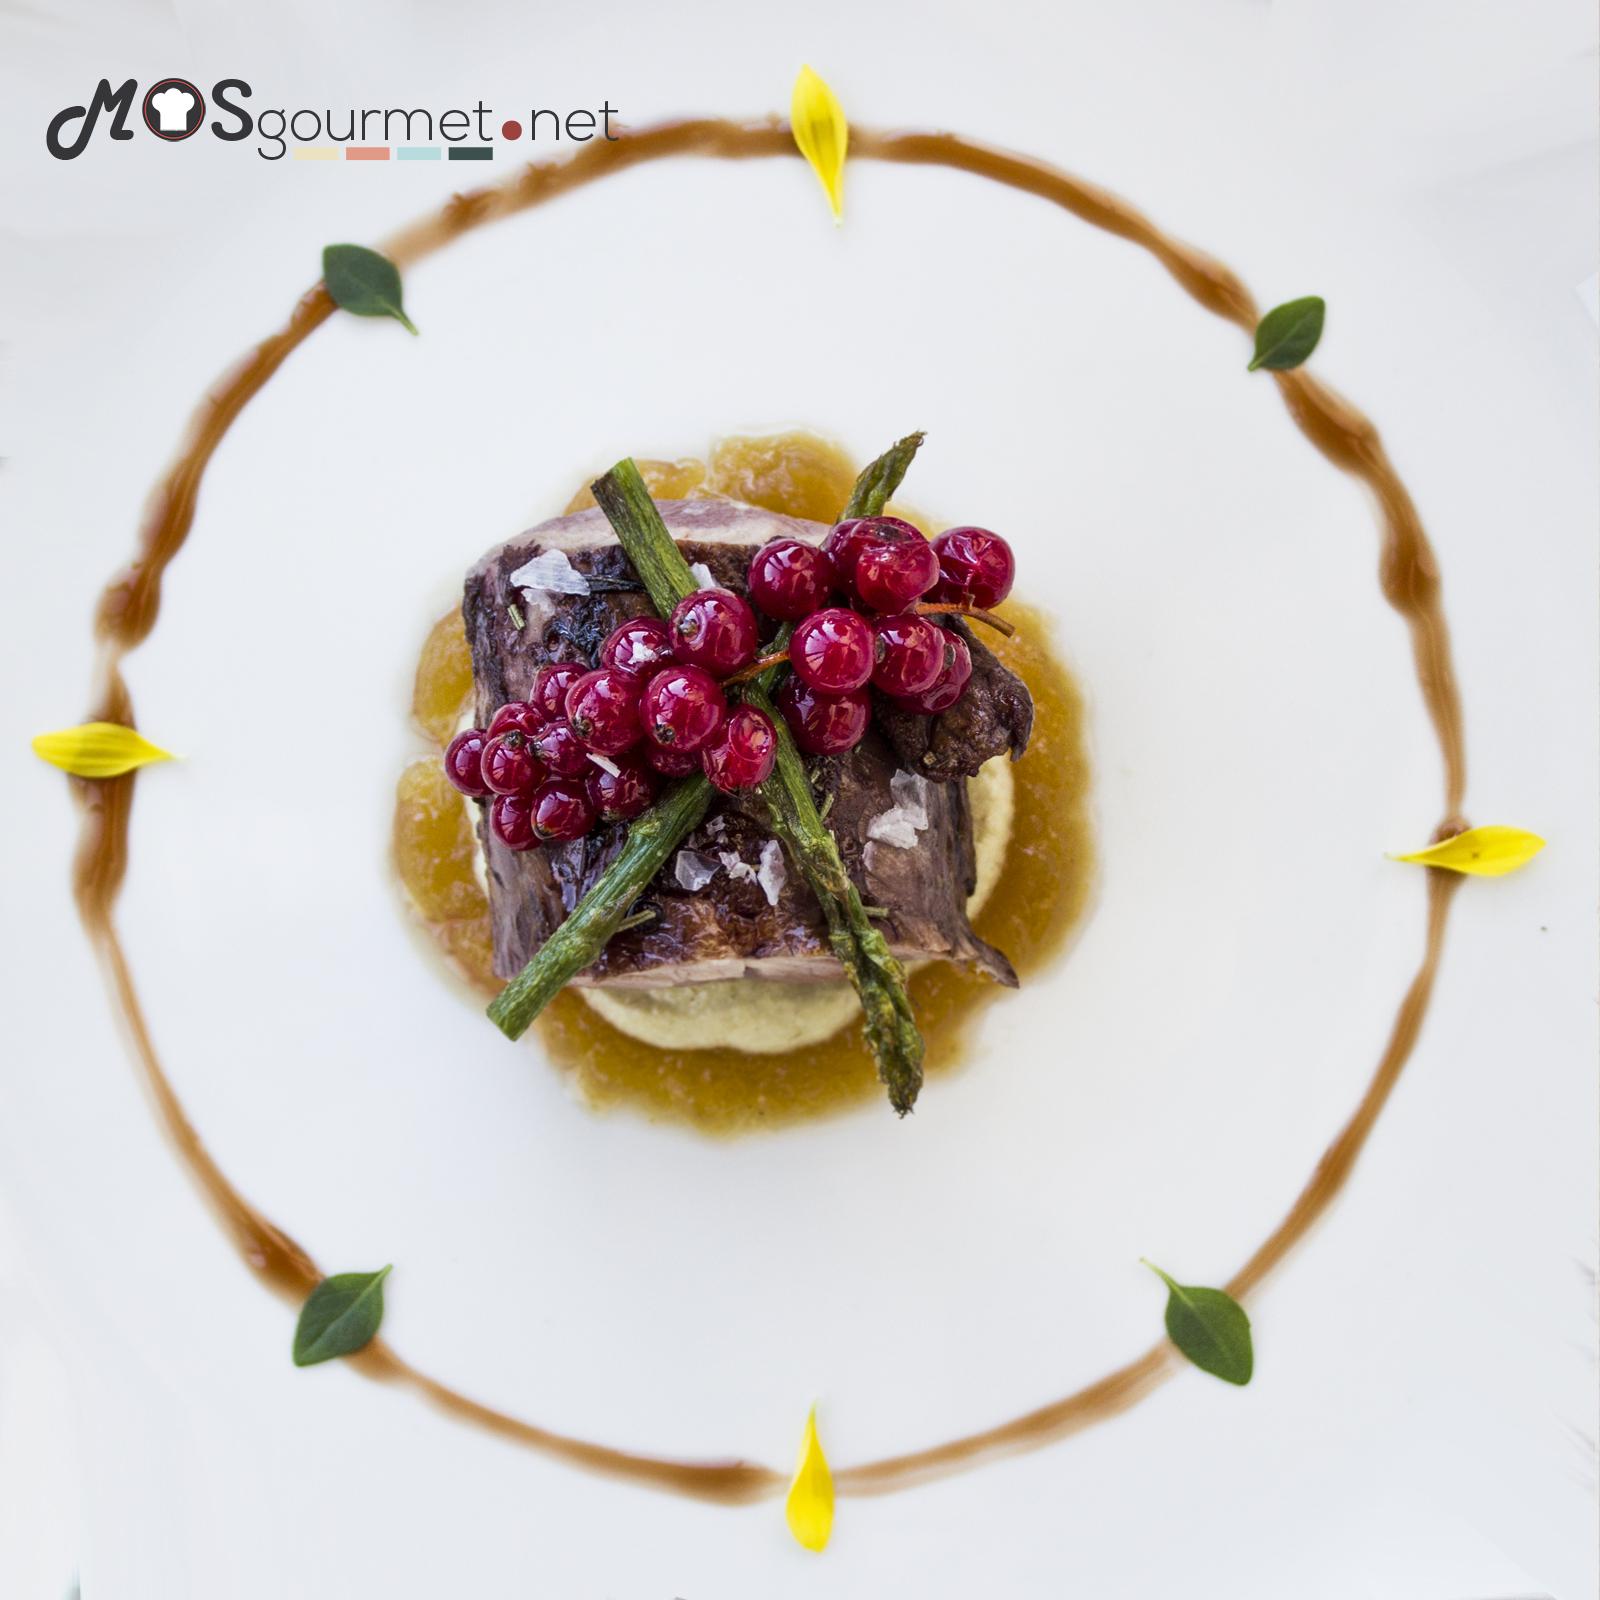 solomillo-alcachofas-humo-manzana-mosgourmet